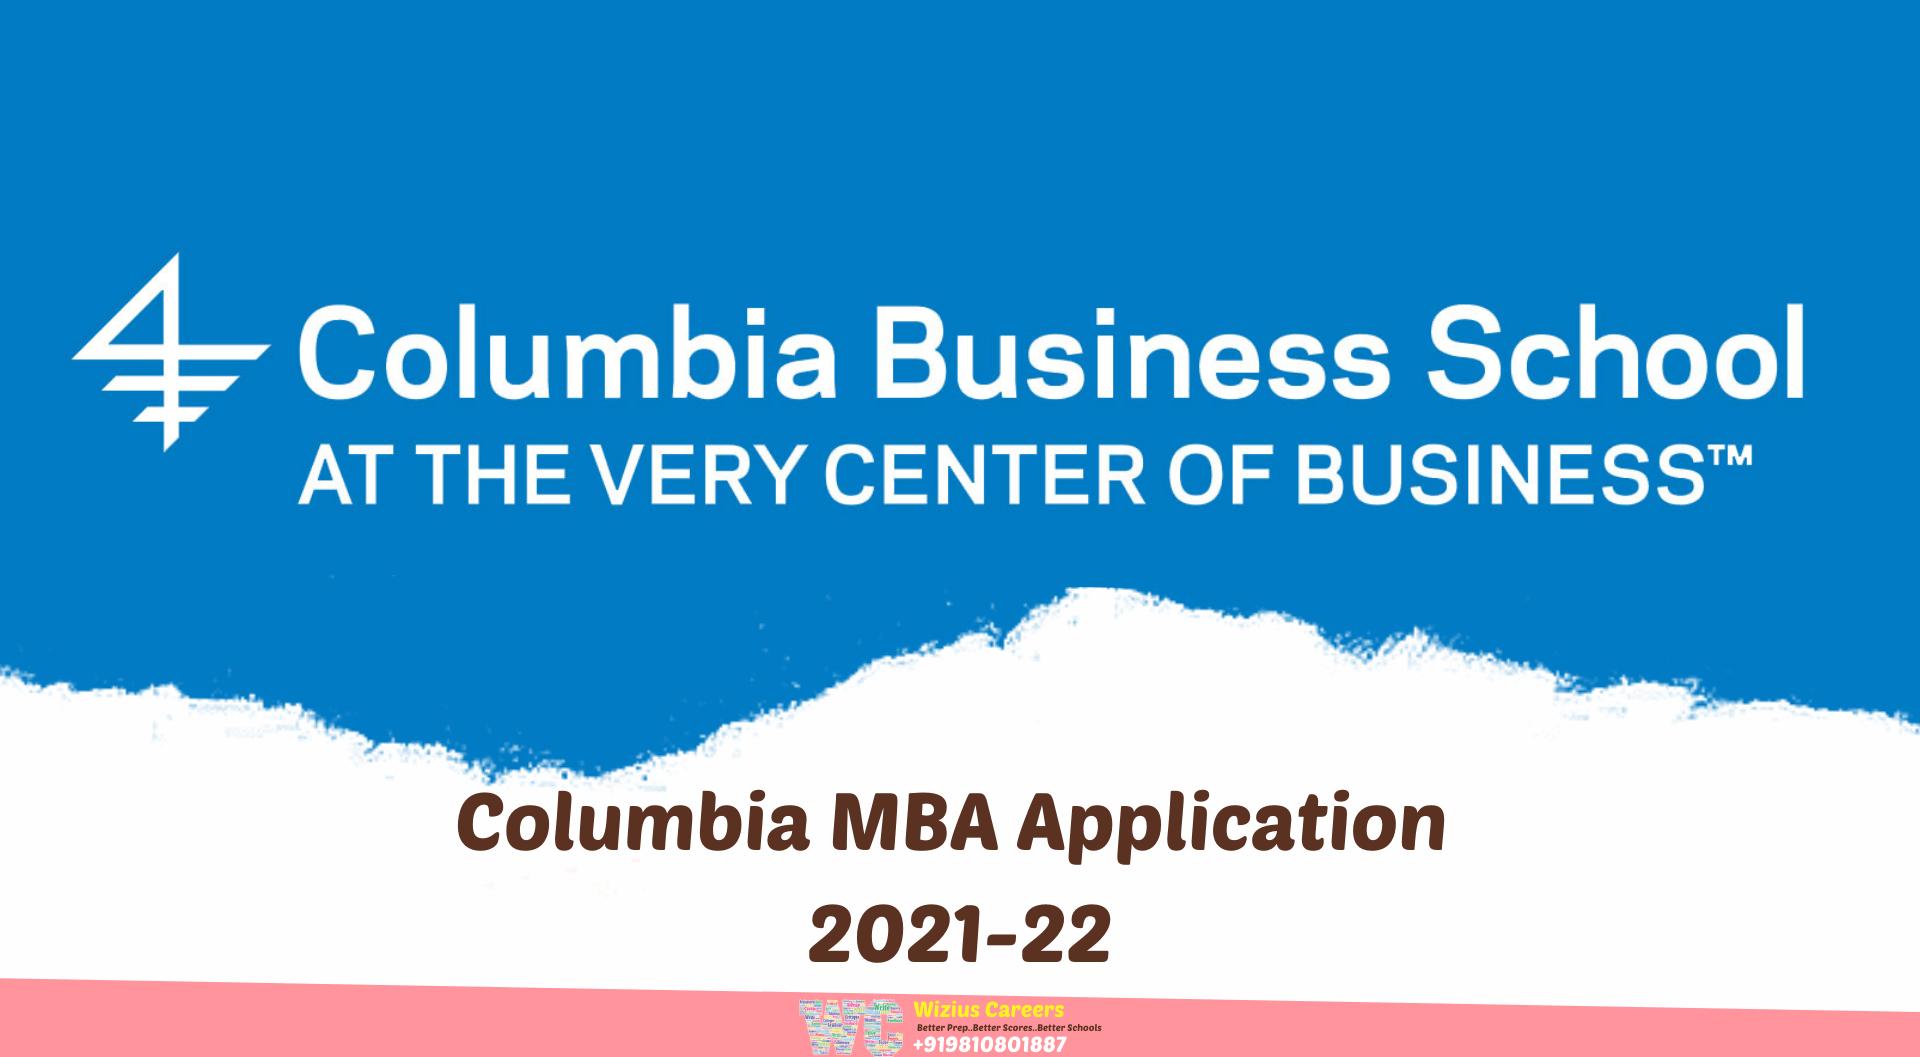 Columbia MBA Application 2021-22